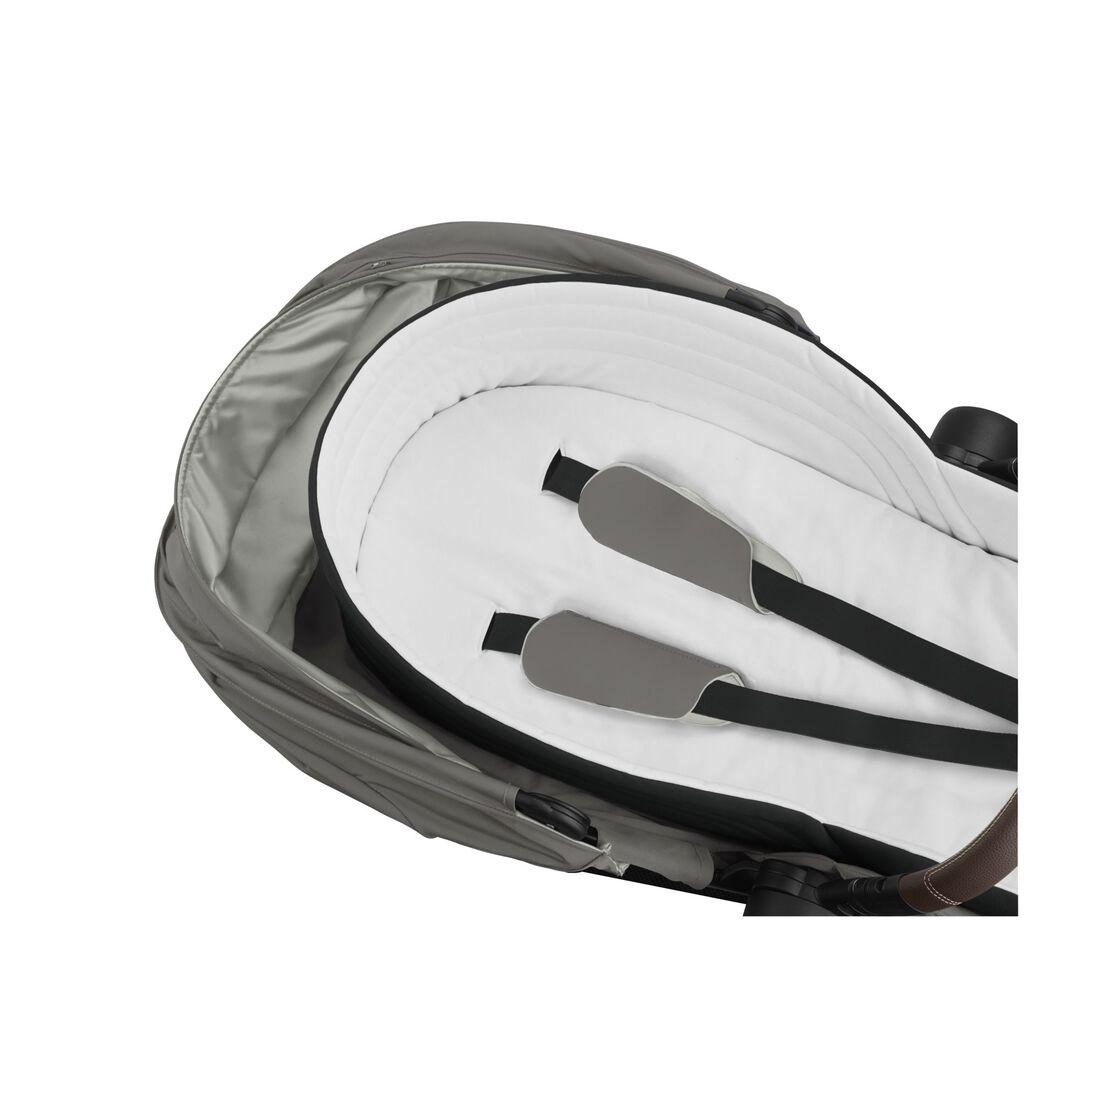 CYBEX Lite Cot - Soho Grey in Soho Grey large image number 2